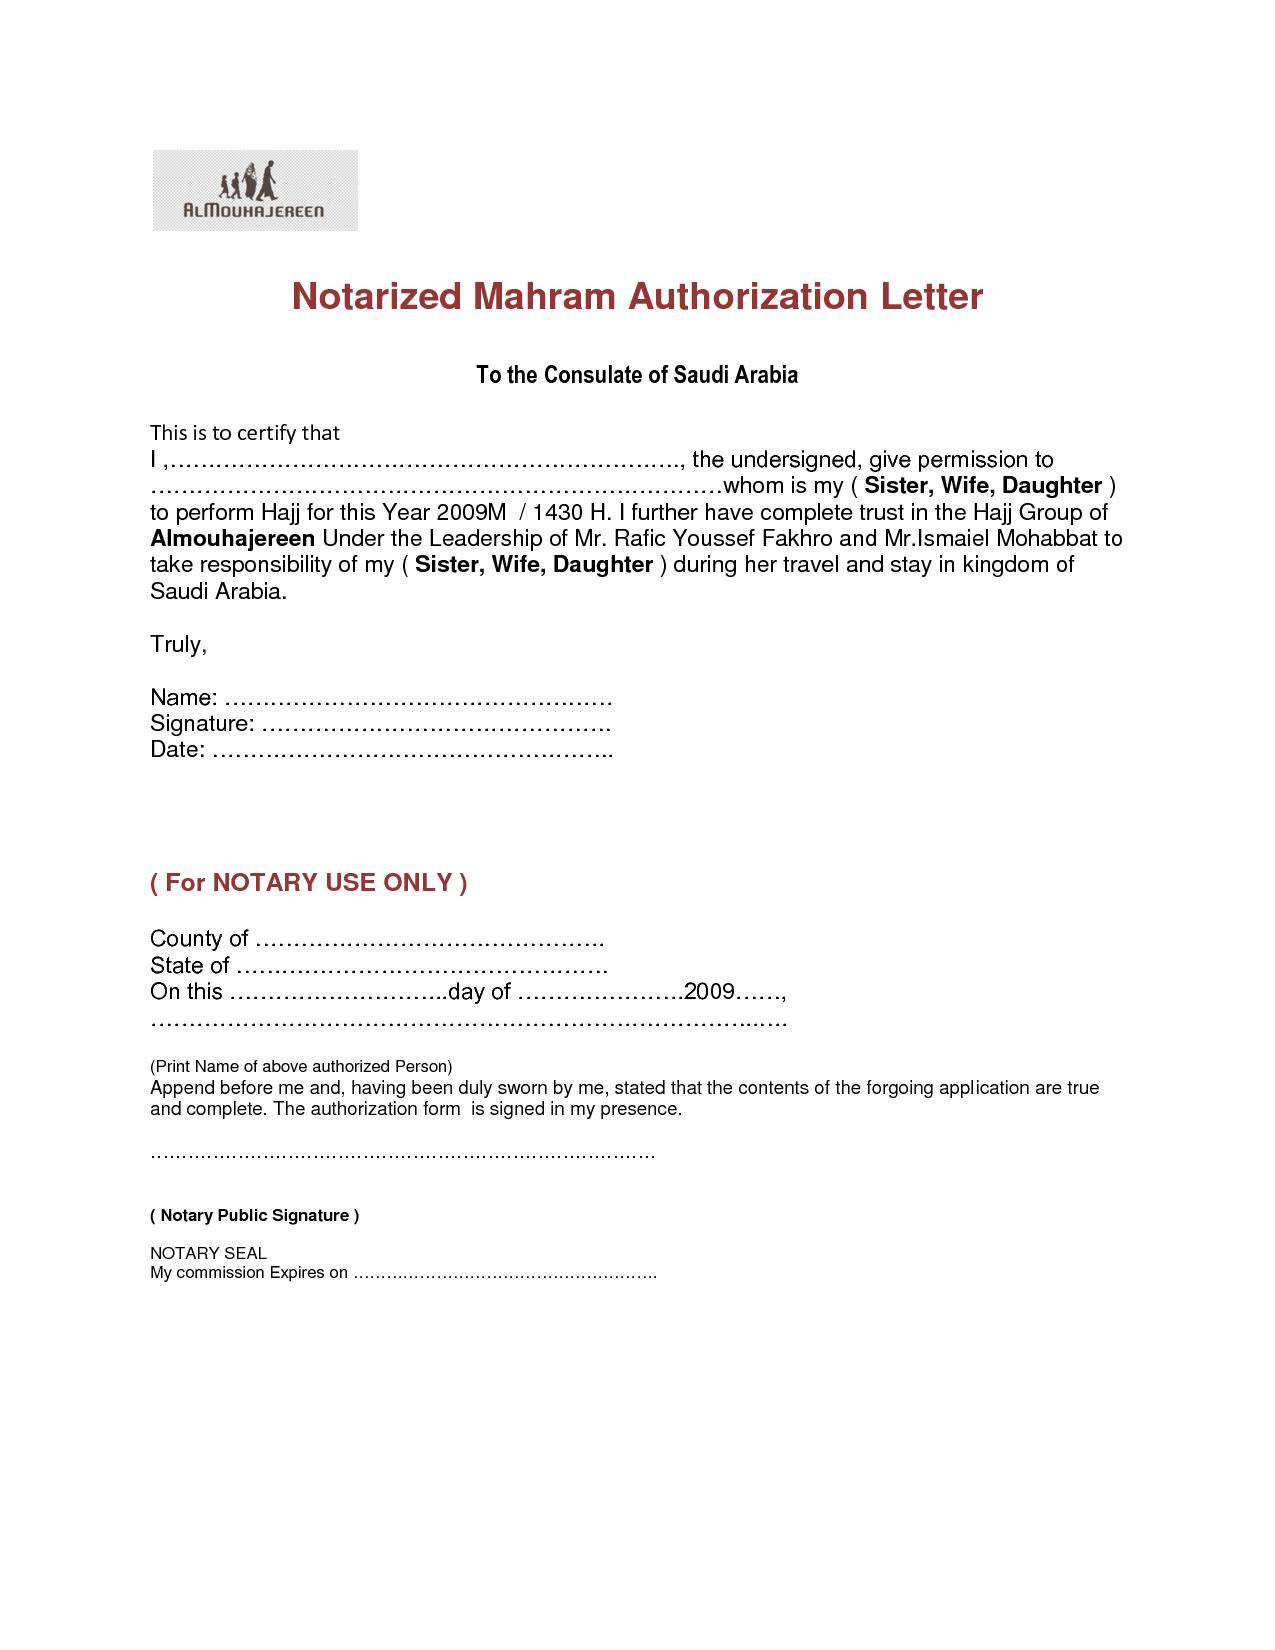 Authorization Letter Format Notarized Field Trip Permission Parents Jos Gandos Coloring Pages